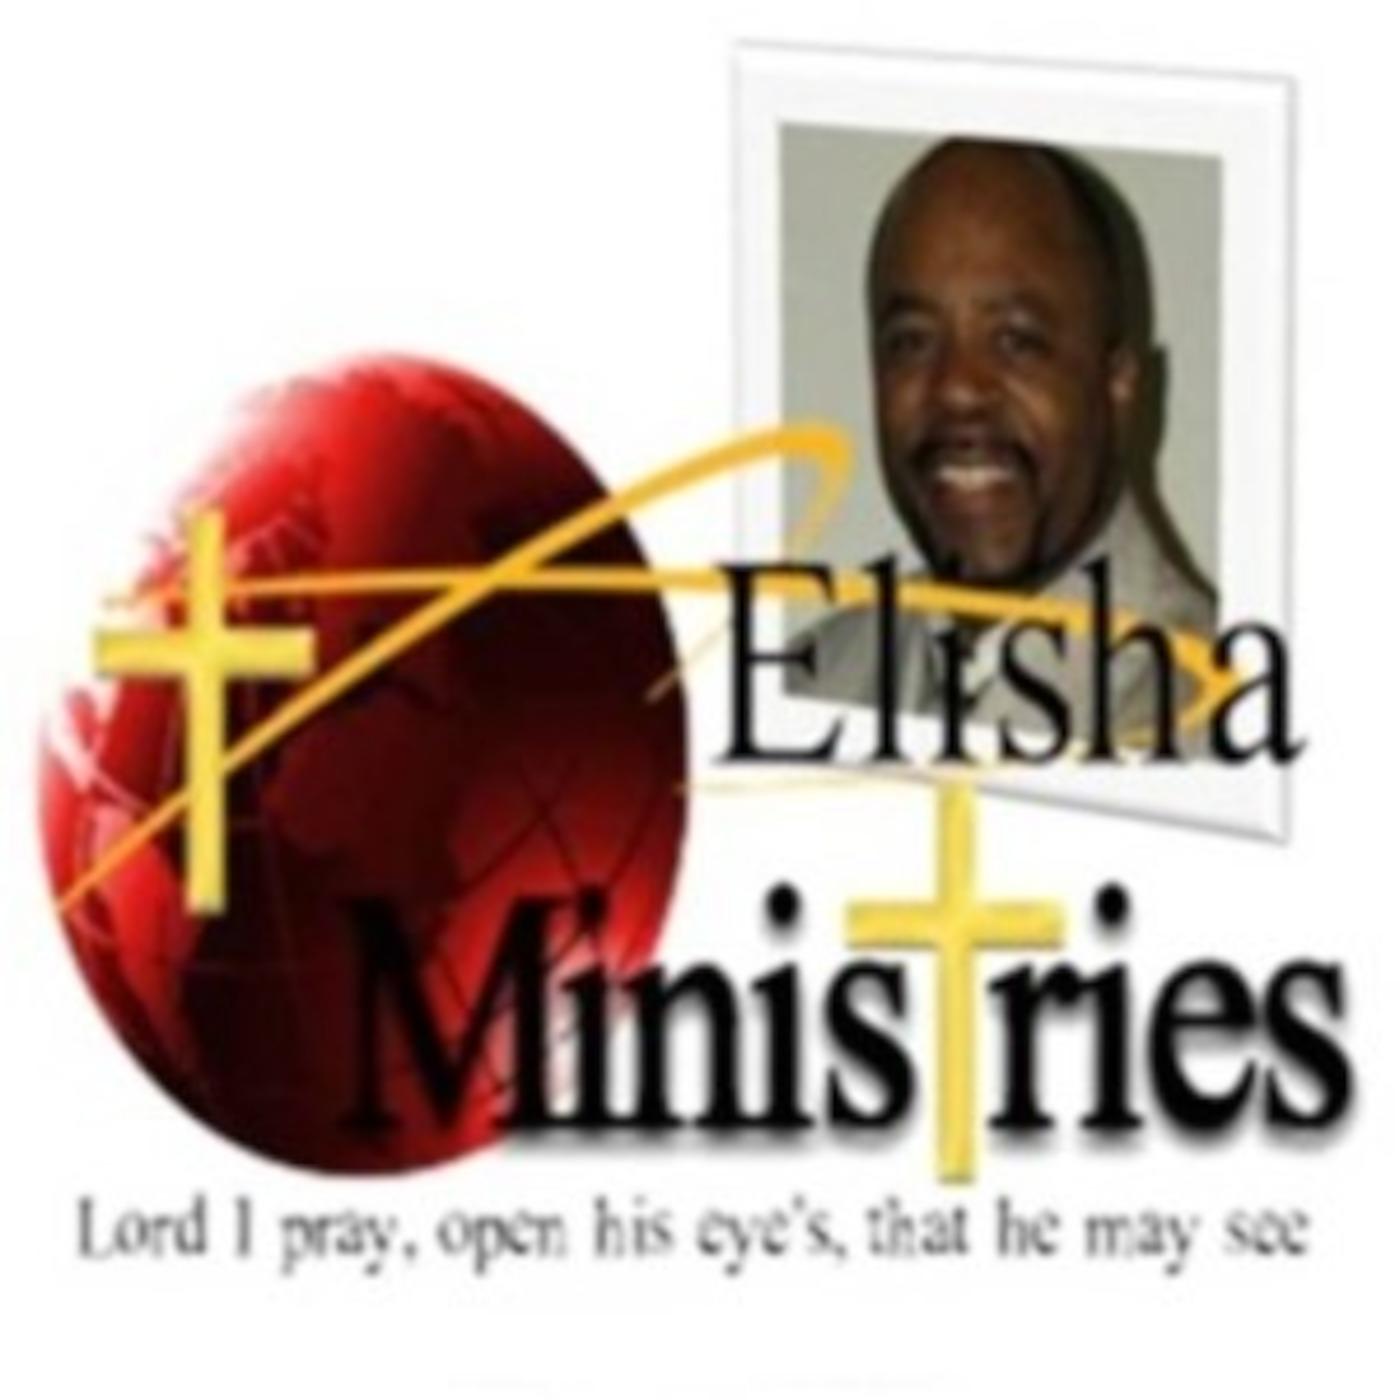 Elisha's Ministries Podcast